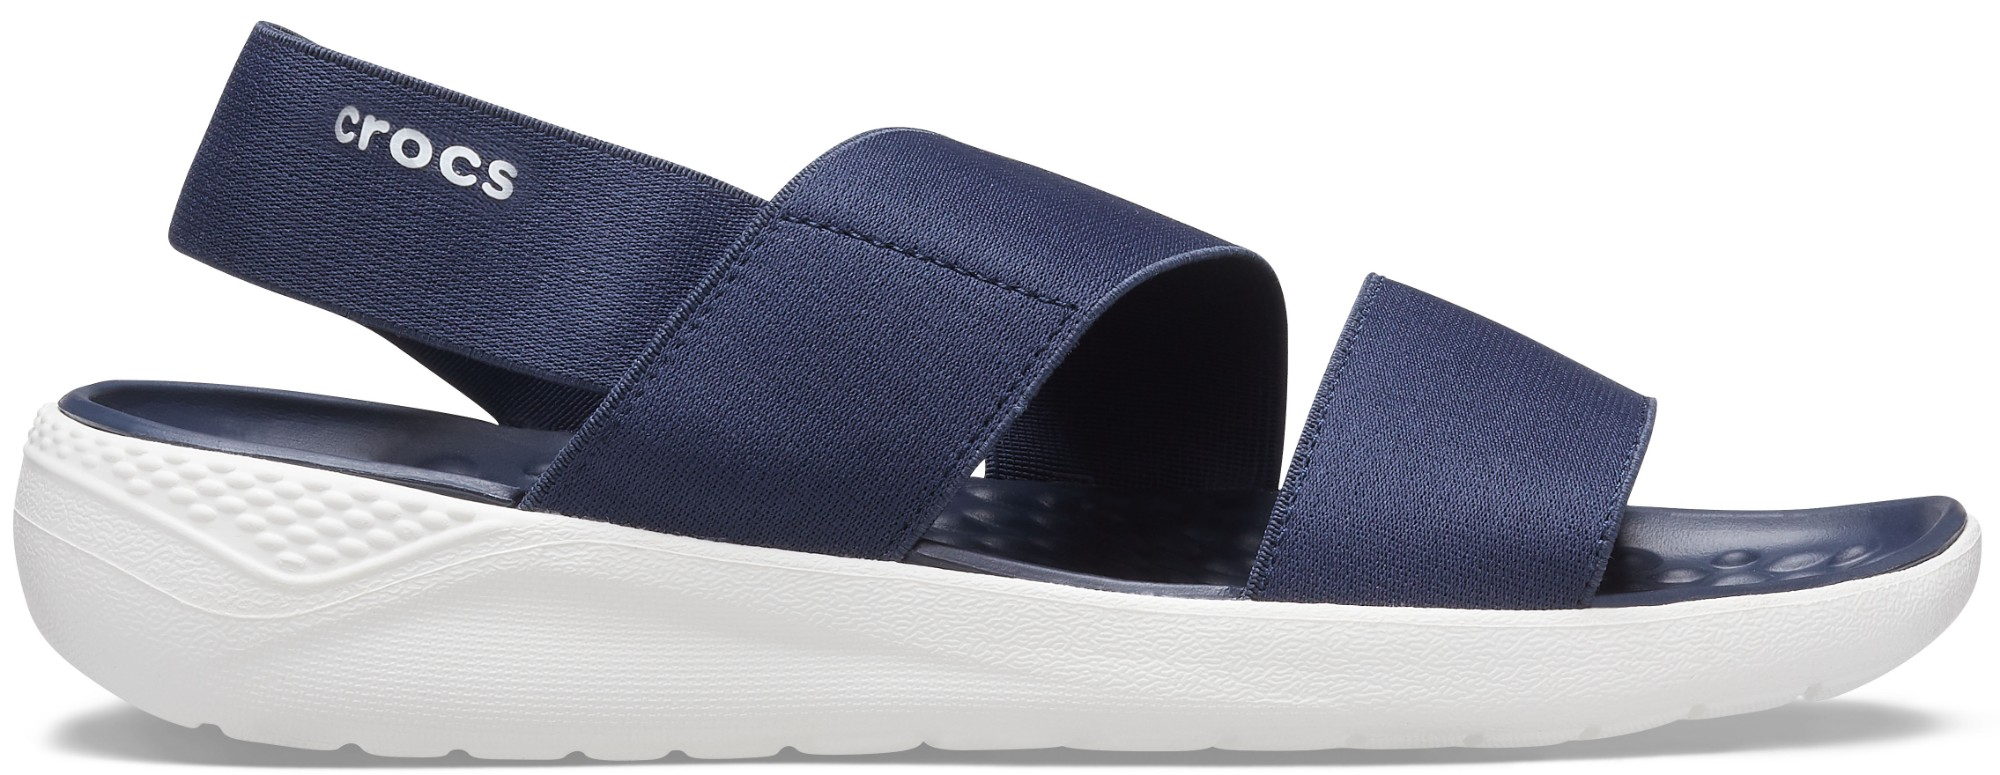 Crocs™ Literide Stretch Sandal Womens Navy/White 36,5